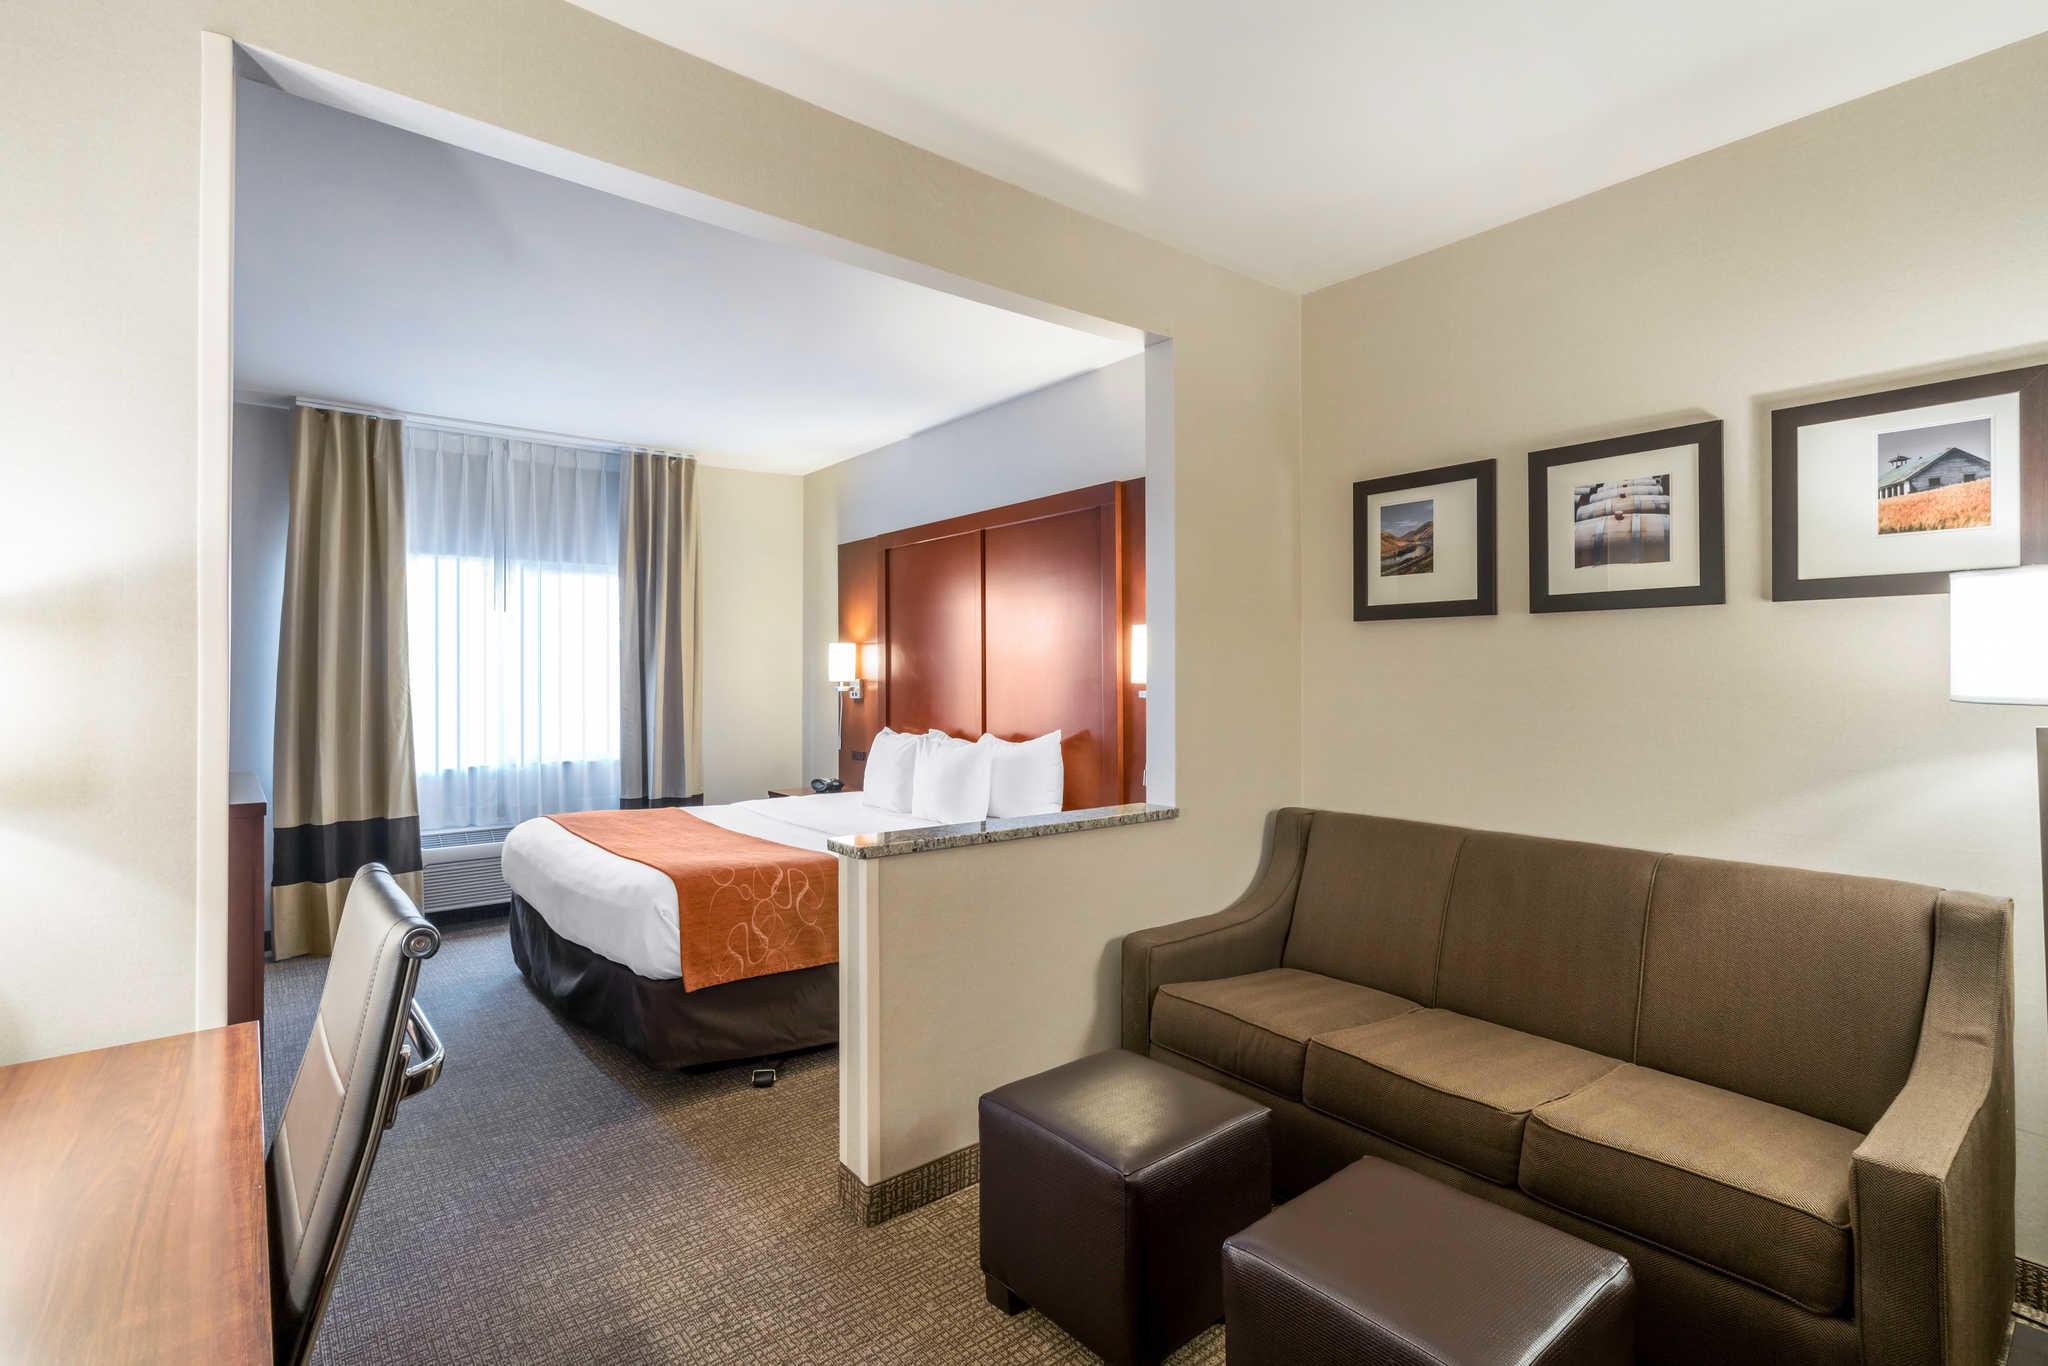 Comfort Suites image 9